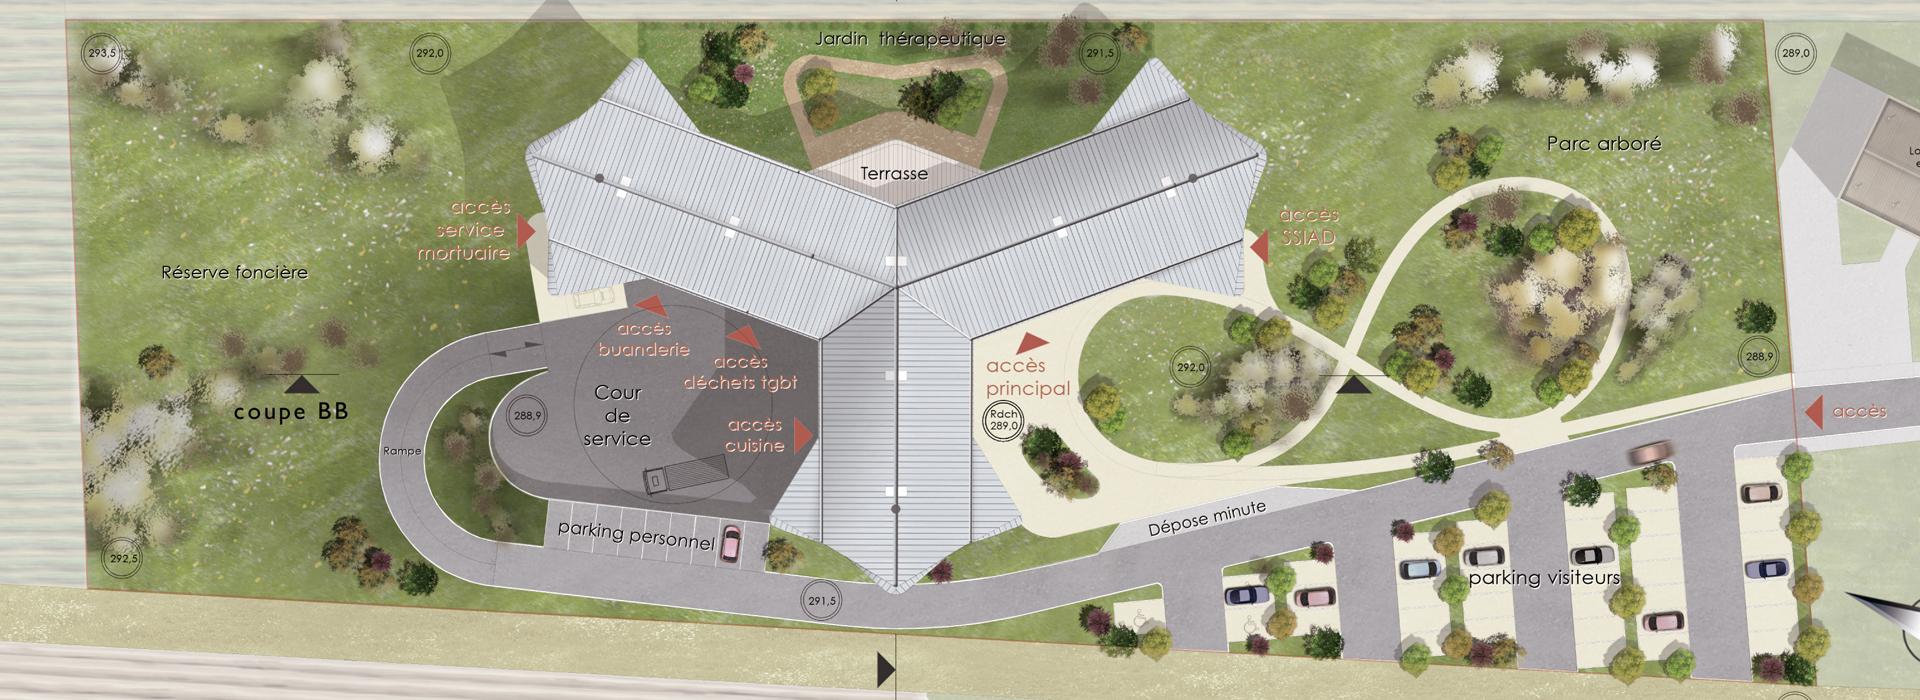 Architecte conception ephad